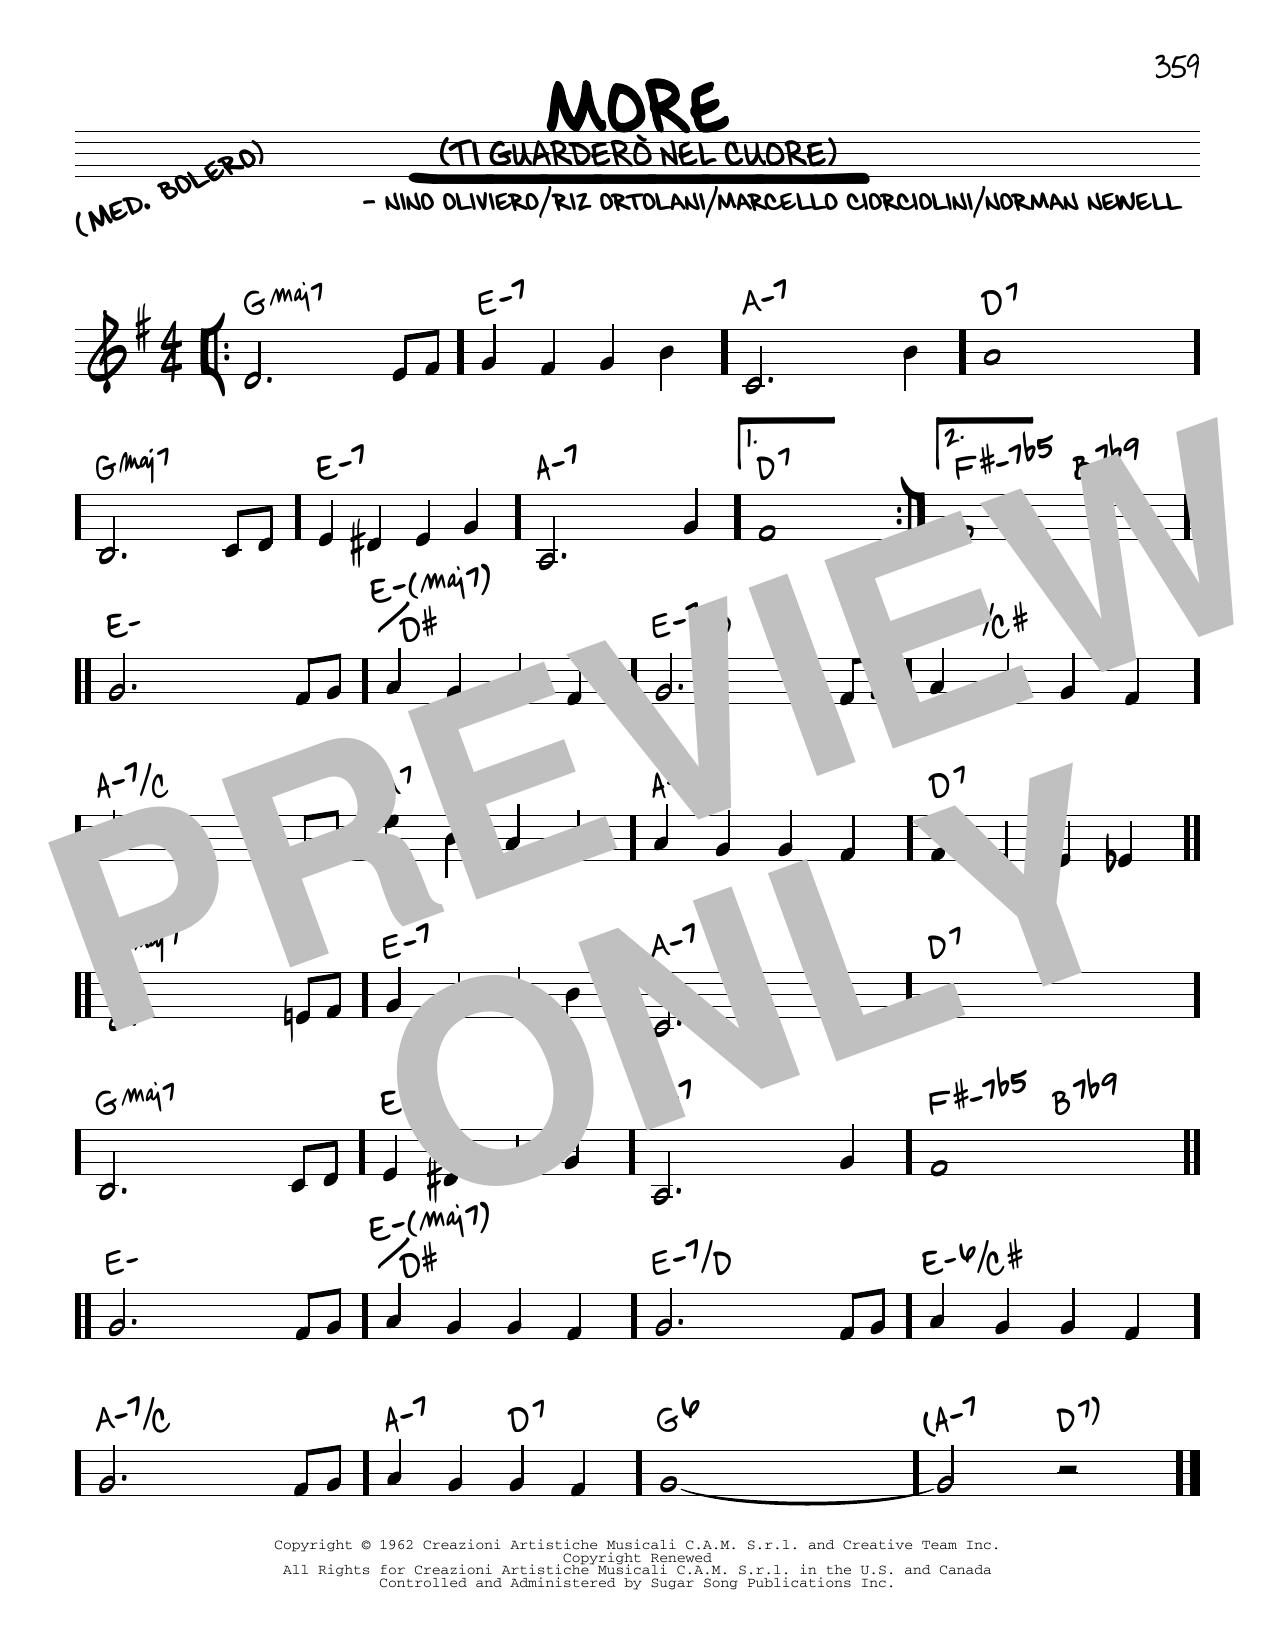 Marcello Ciorciolini More (Ti Guardero Nel Cuore) sheet music preview music notes and score for Guitar Tab including 3 page(s)